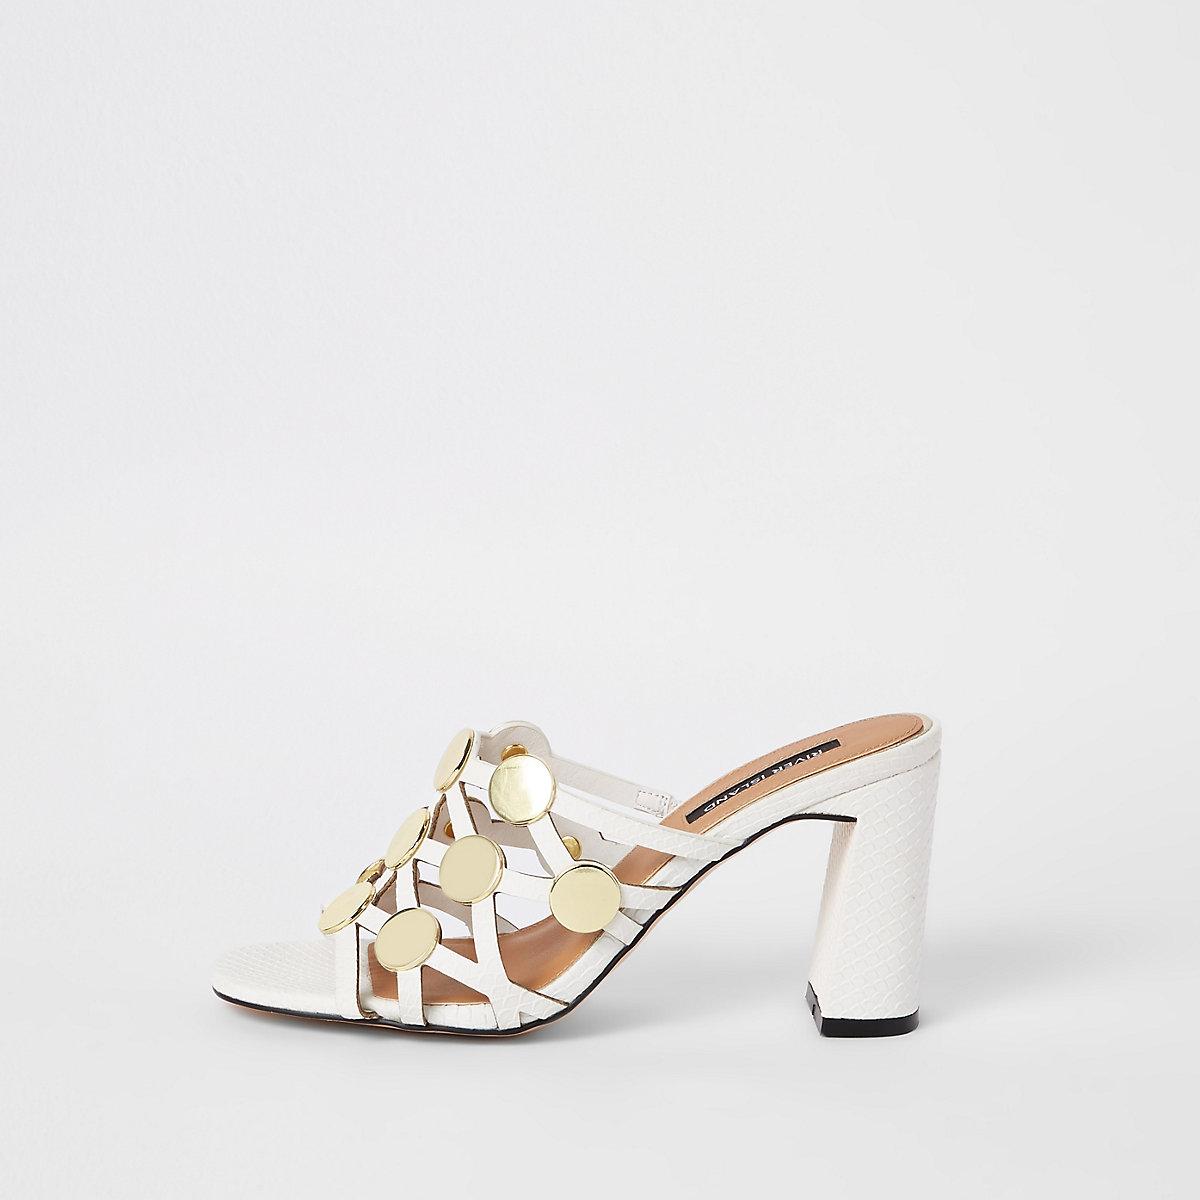 Blokhak En amp; Laarzen Witte Sandalen Met Schoenen Cirkel wfCITq